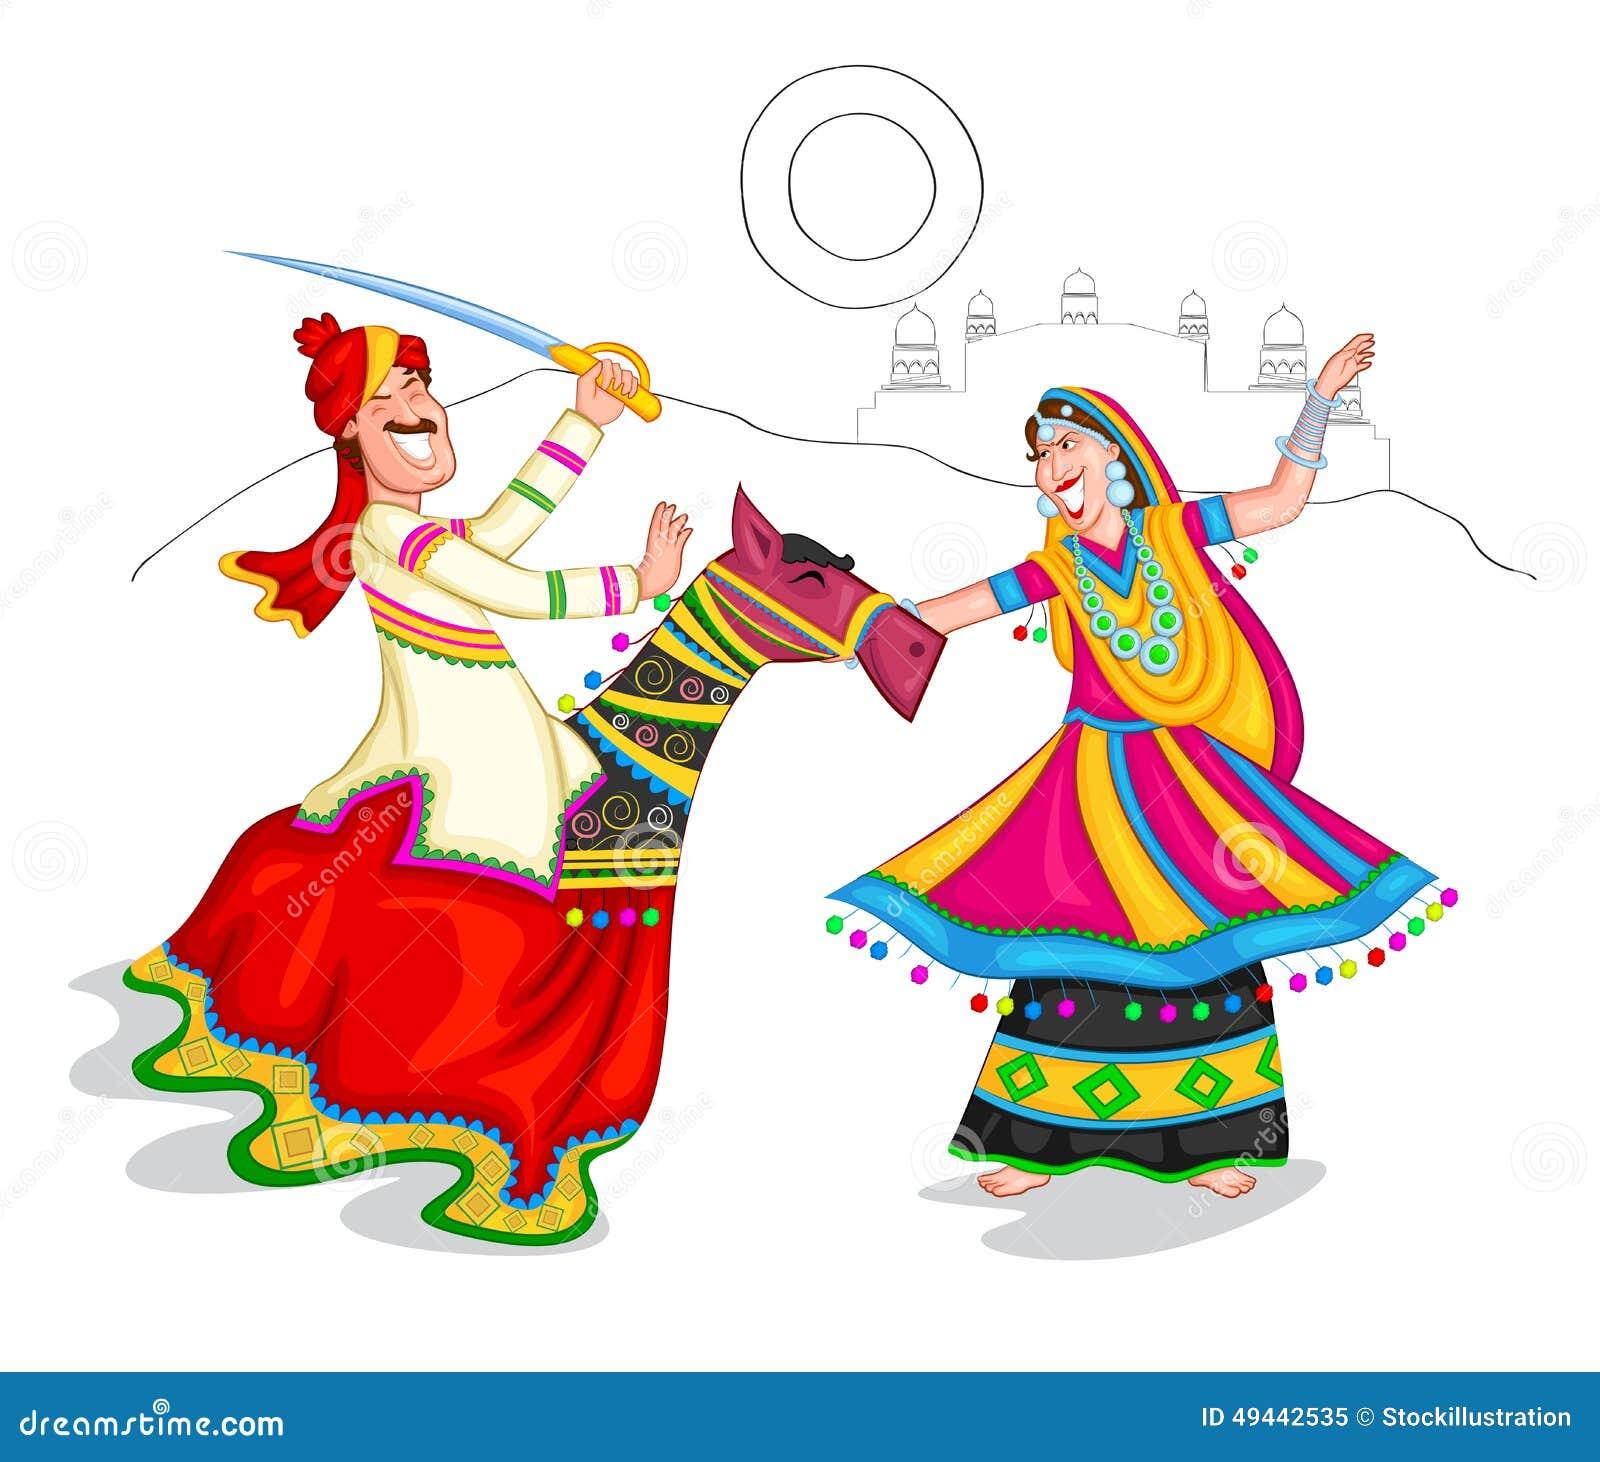 A bollywood dance ritual 8